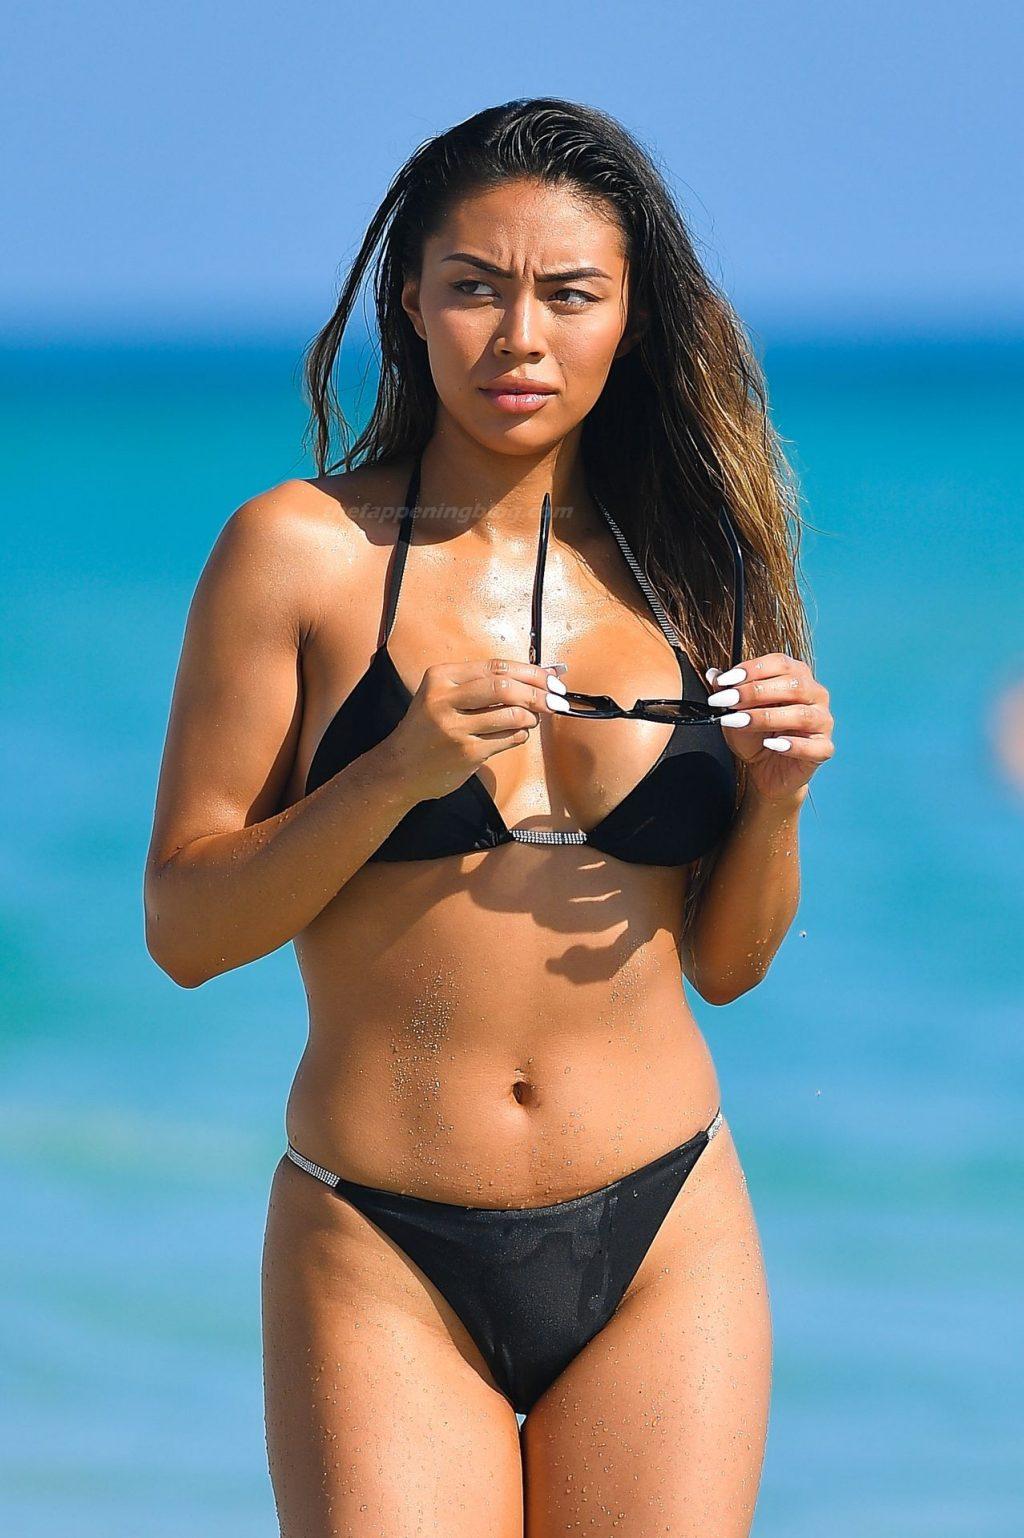 Montana Yao Shows Her Sexy Bikini Body on the Beach in Miami (55 Photos)